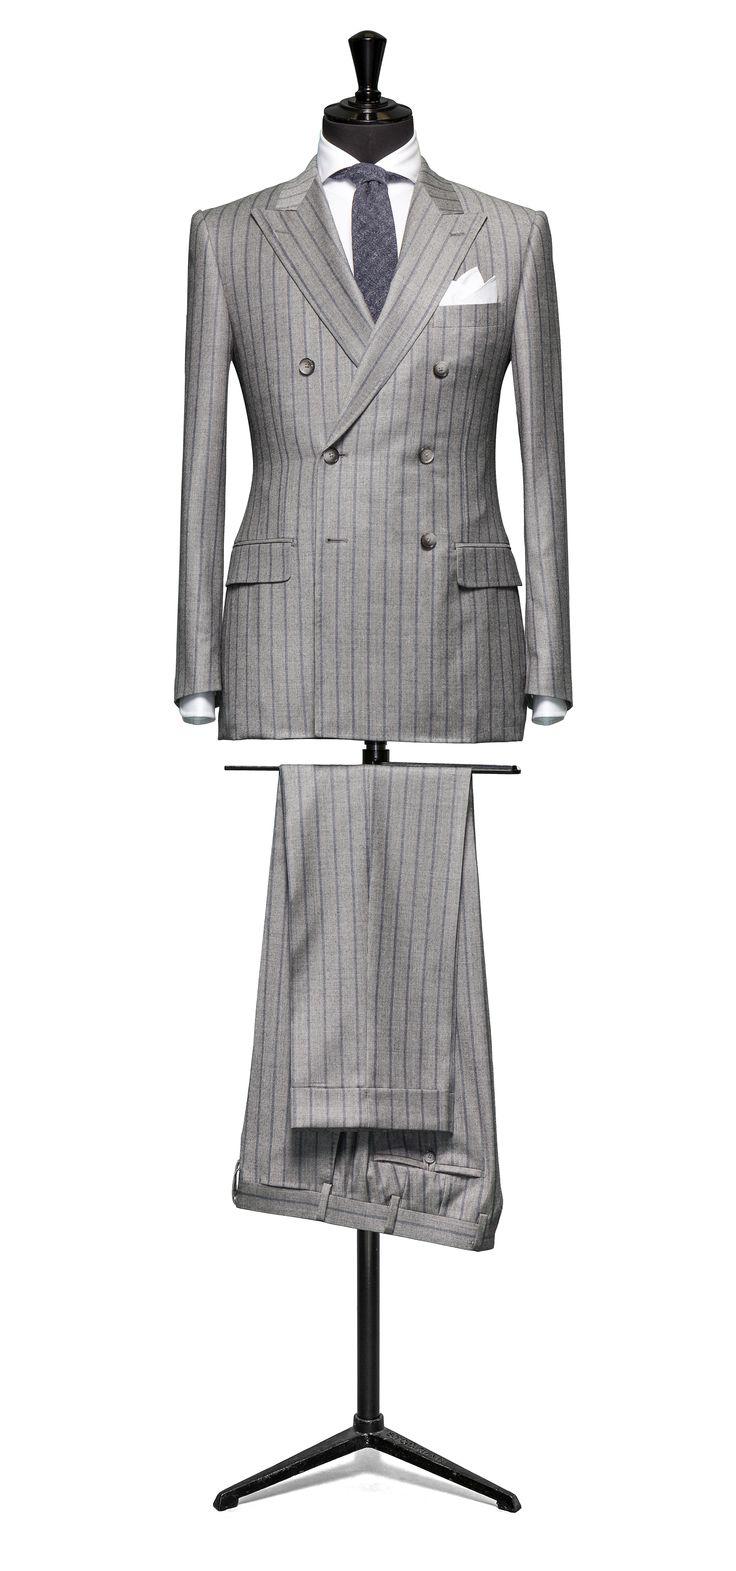 Grey suit Stripe blue http://www.tailormadelondon.com/shop/tailored-suit-fabric-4308-stripe-grey/